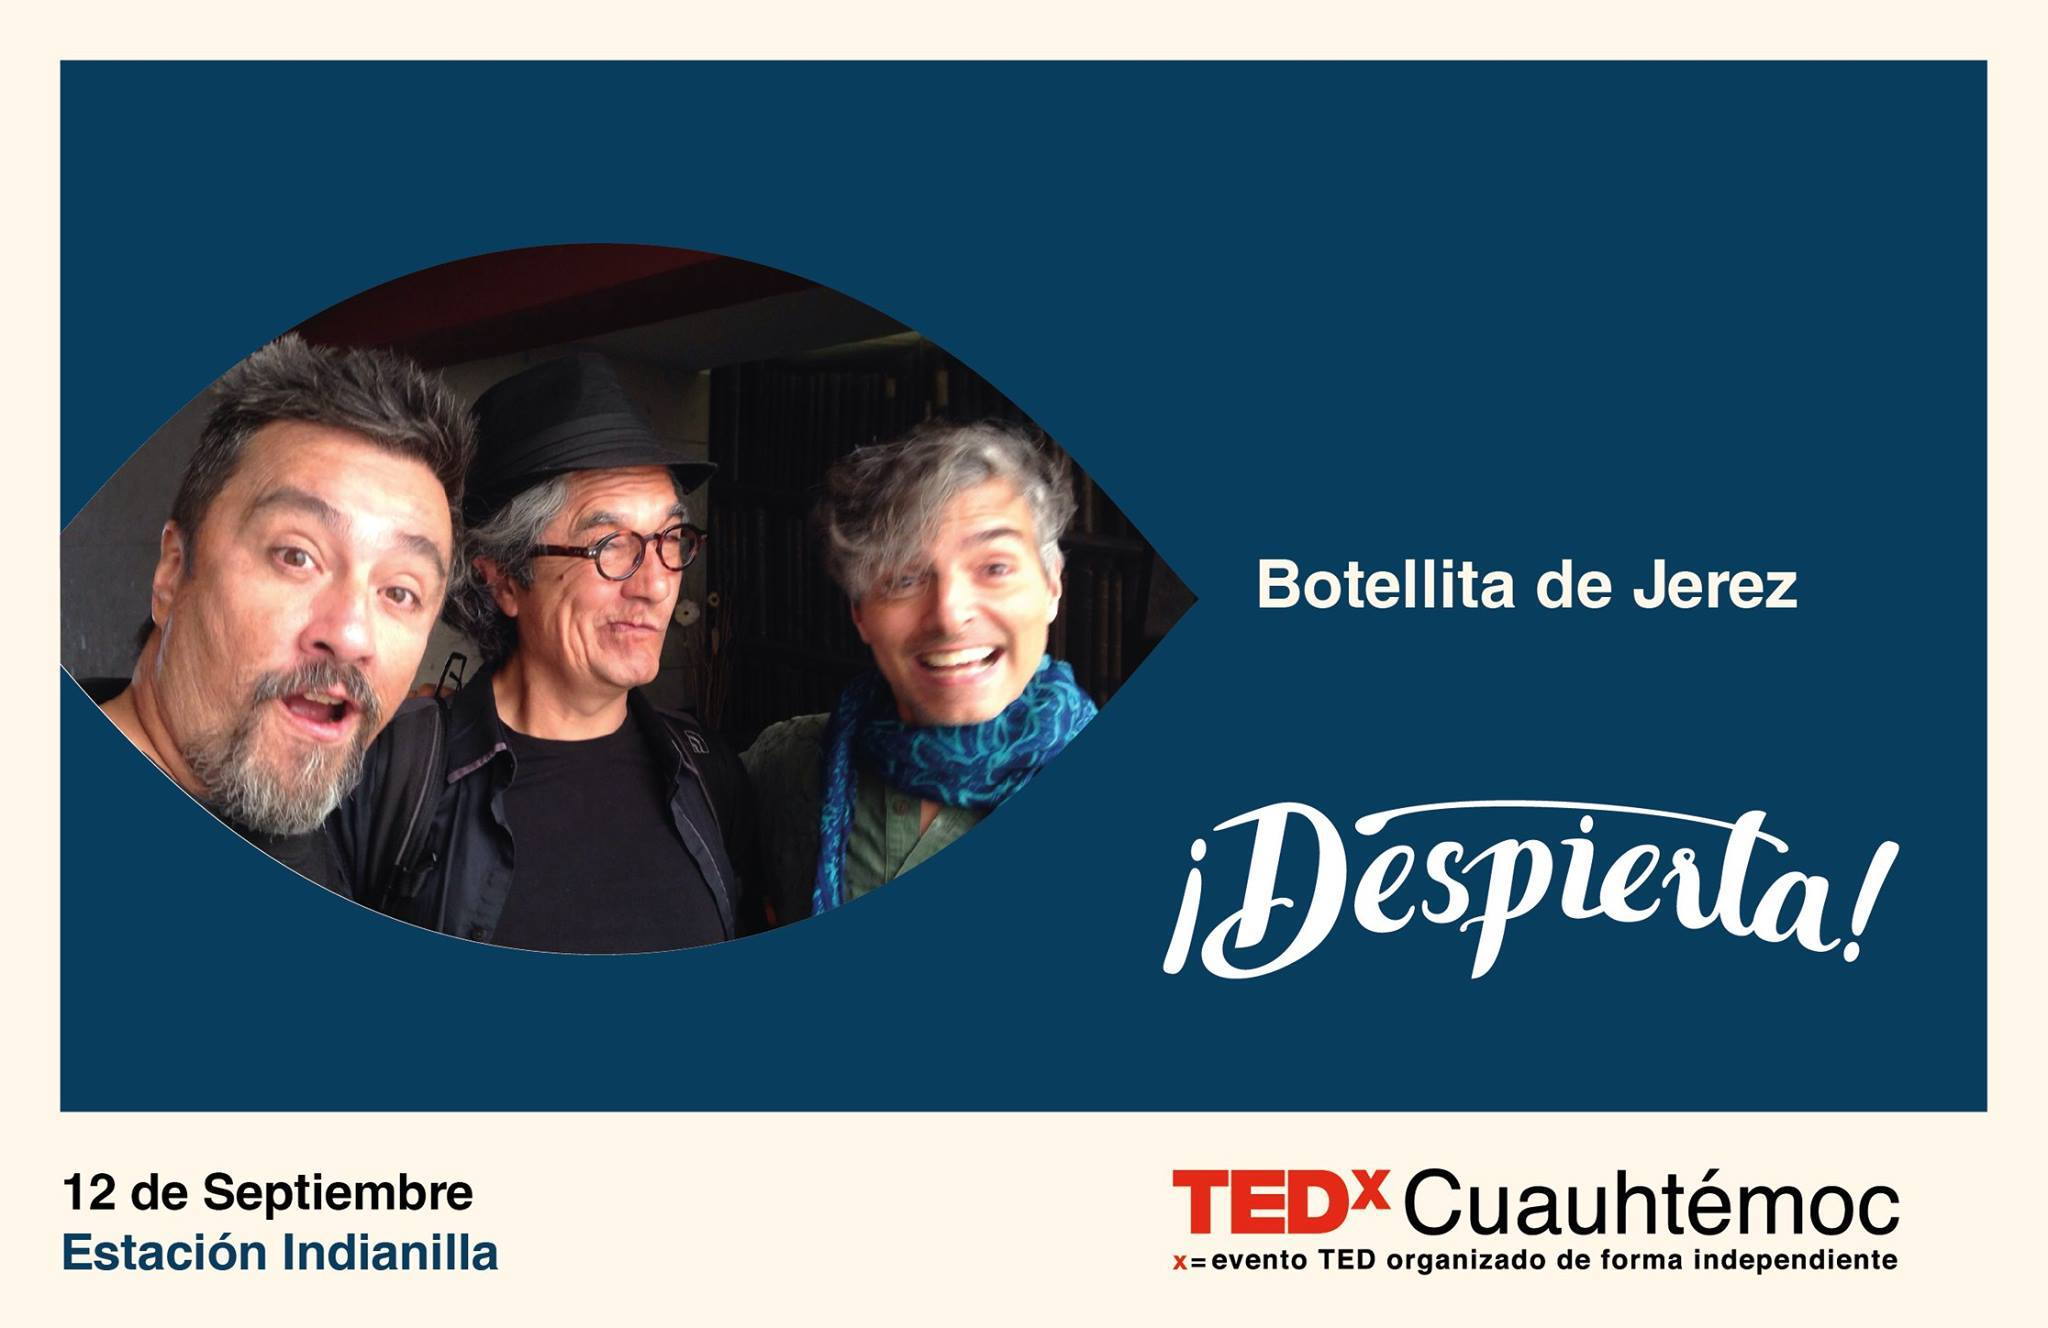 TEDx Botellita de Jerez